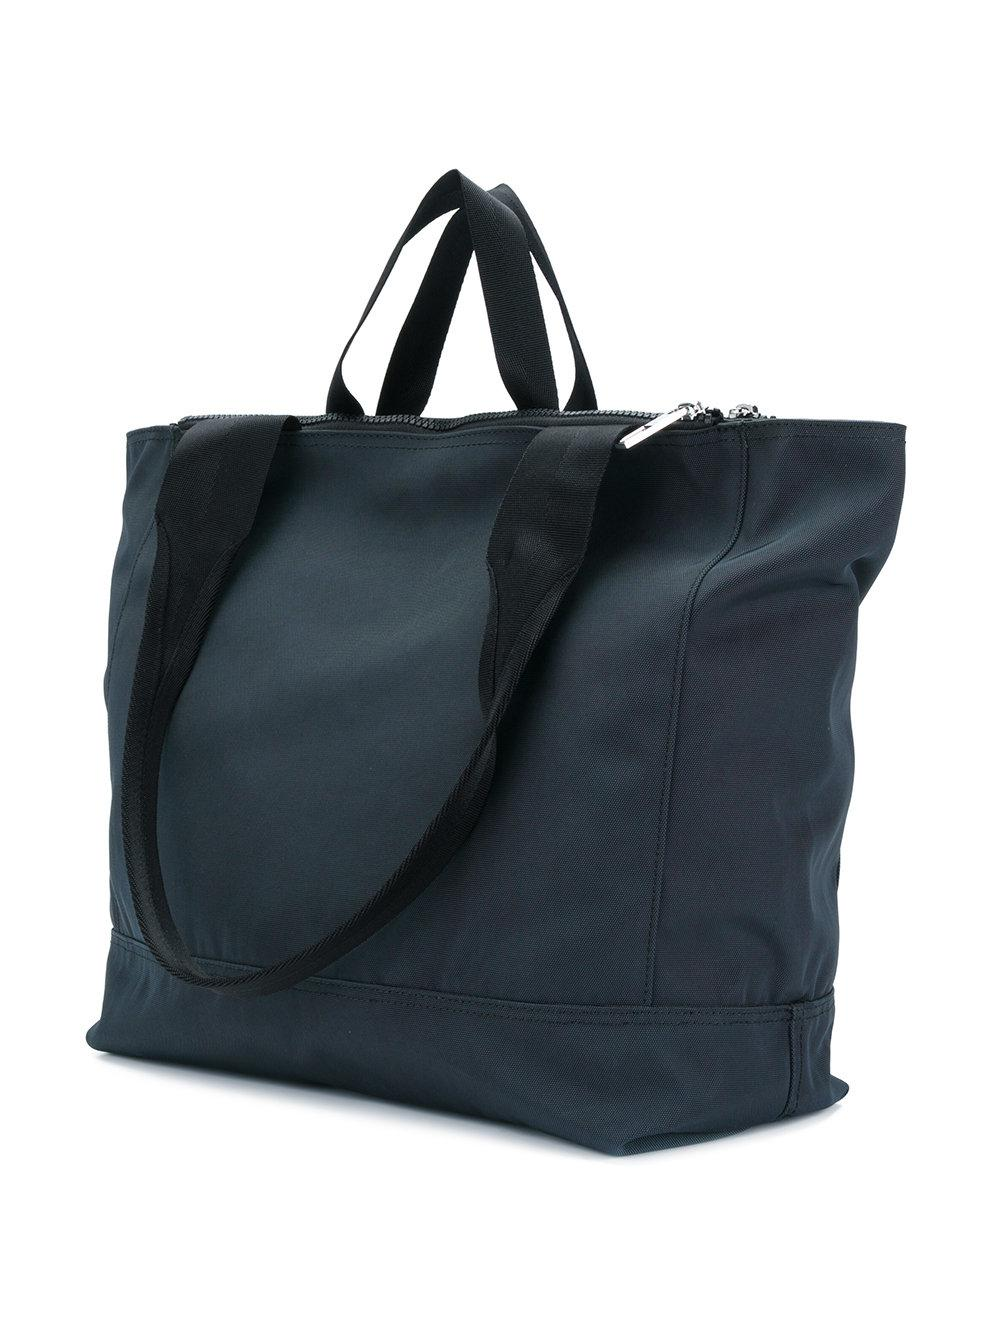 KENZO Tiger Tote Bag in Green for Men